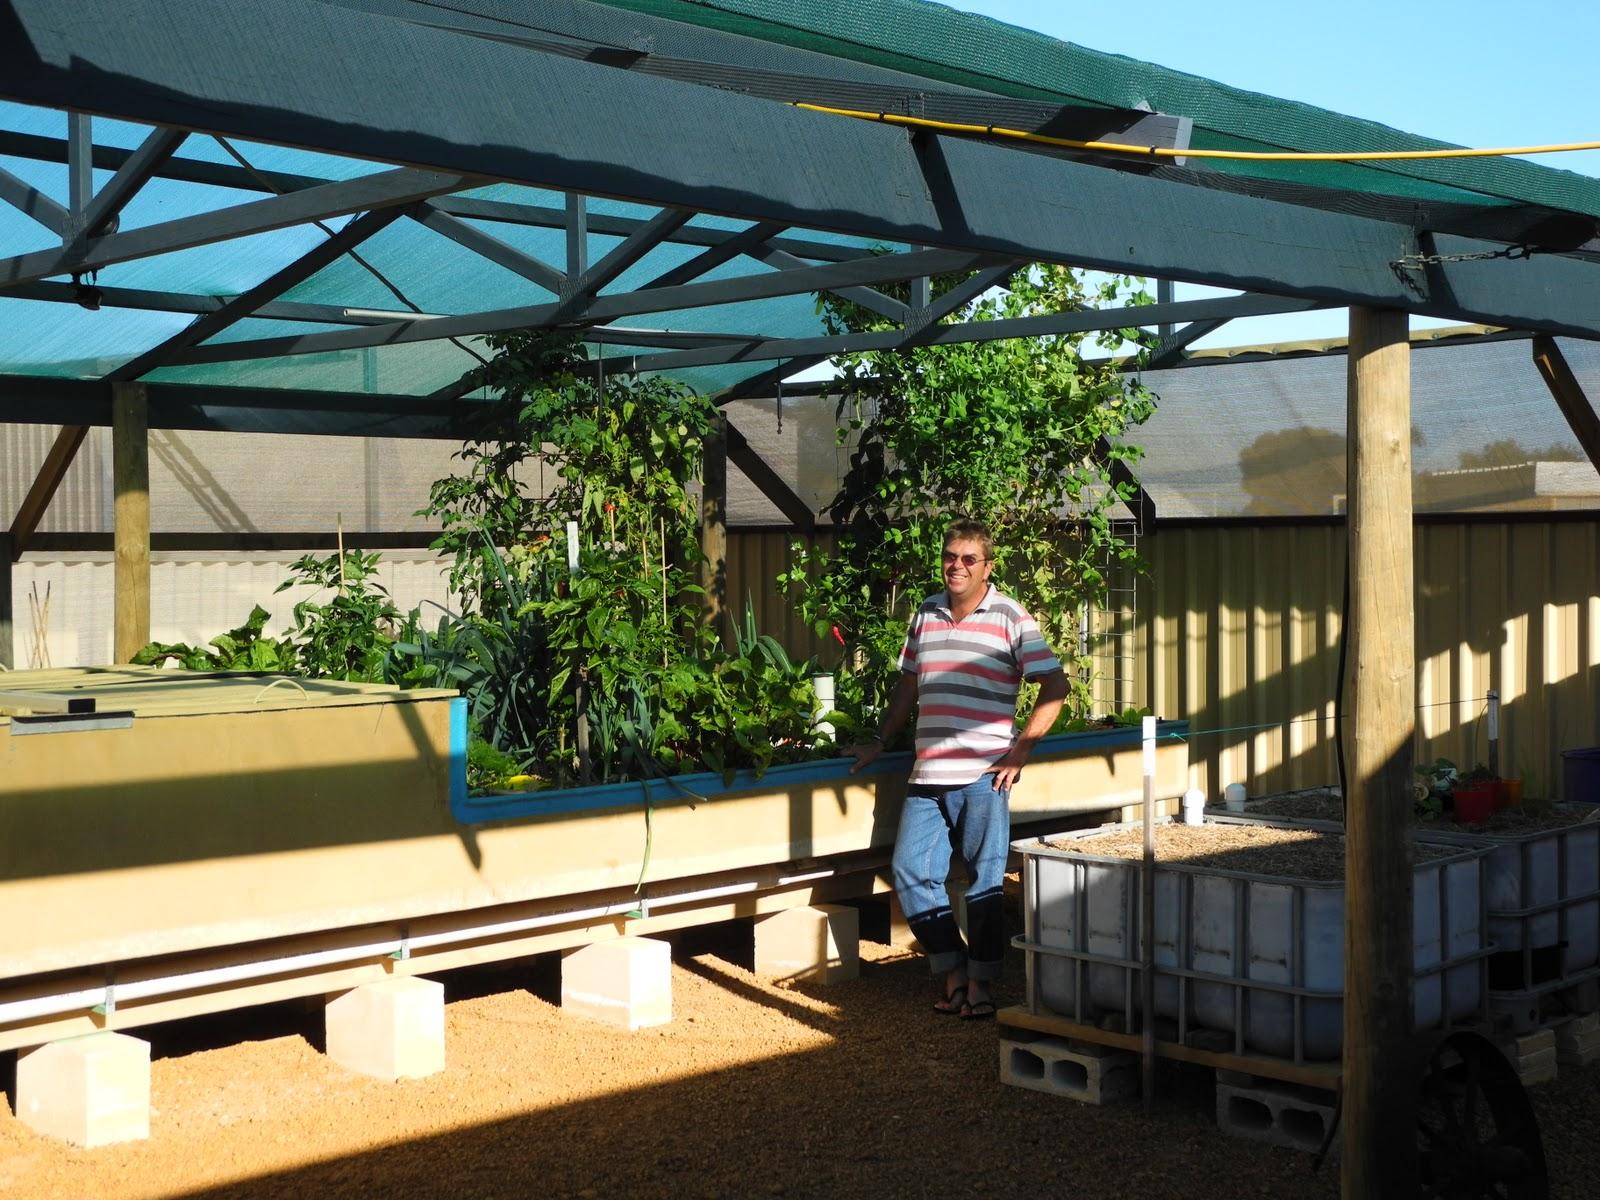 Garden of life aquaponics and salty garden tales for Aquaponics hawaii